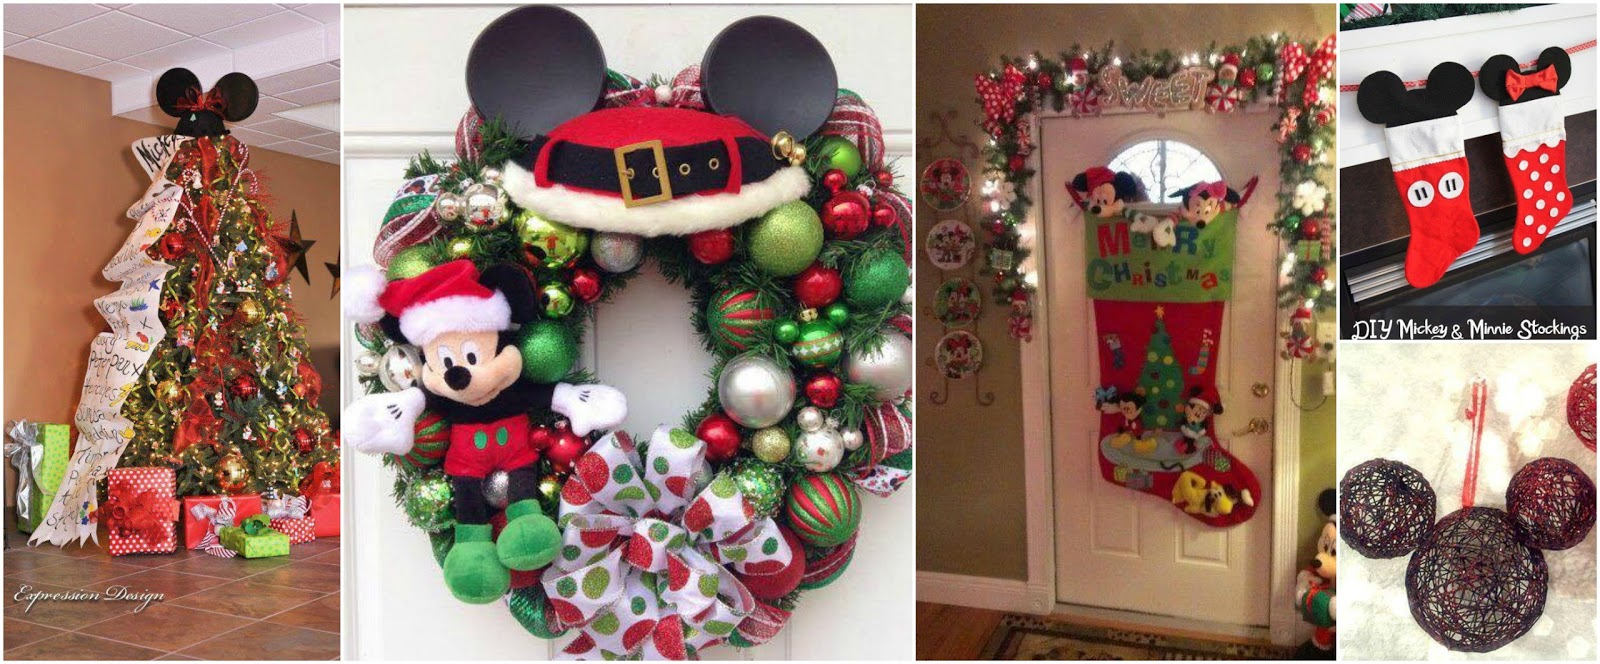 Cositasconmesh - Ideas decorativas navidenas ...